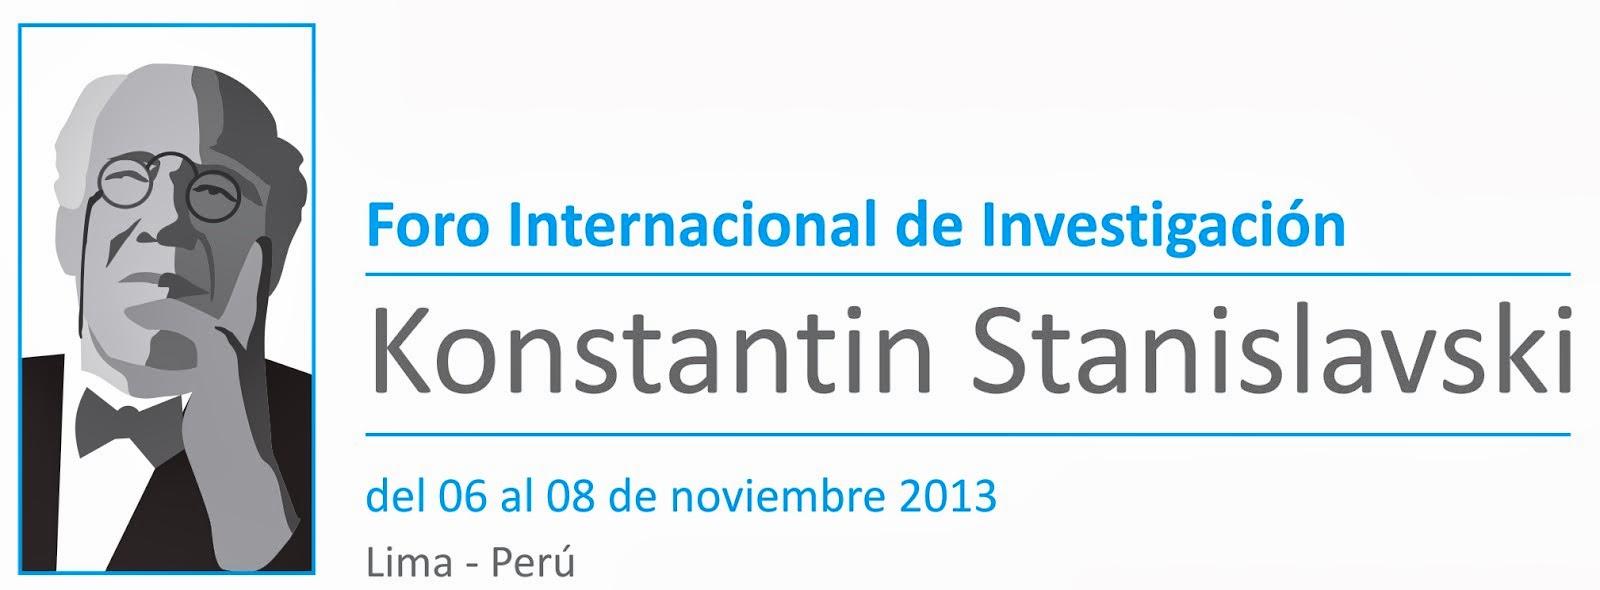 Foro Stanislavski en Lima